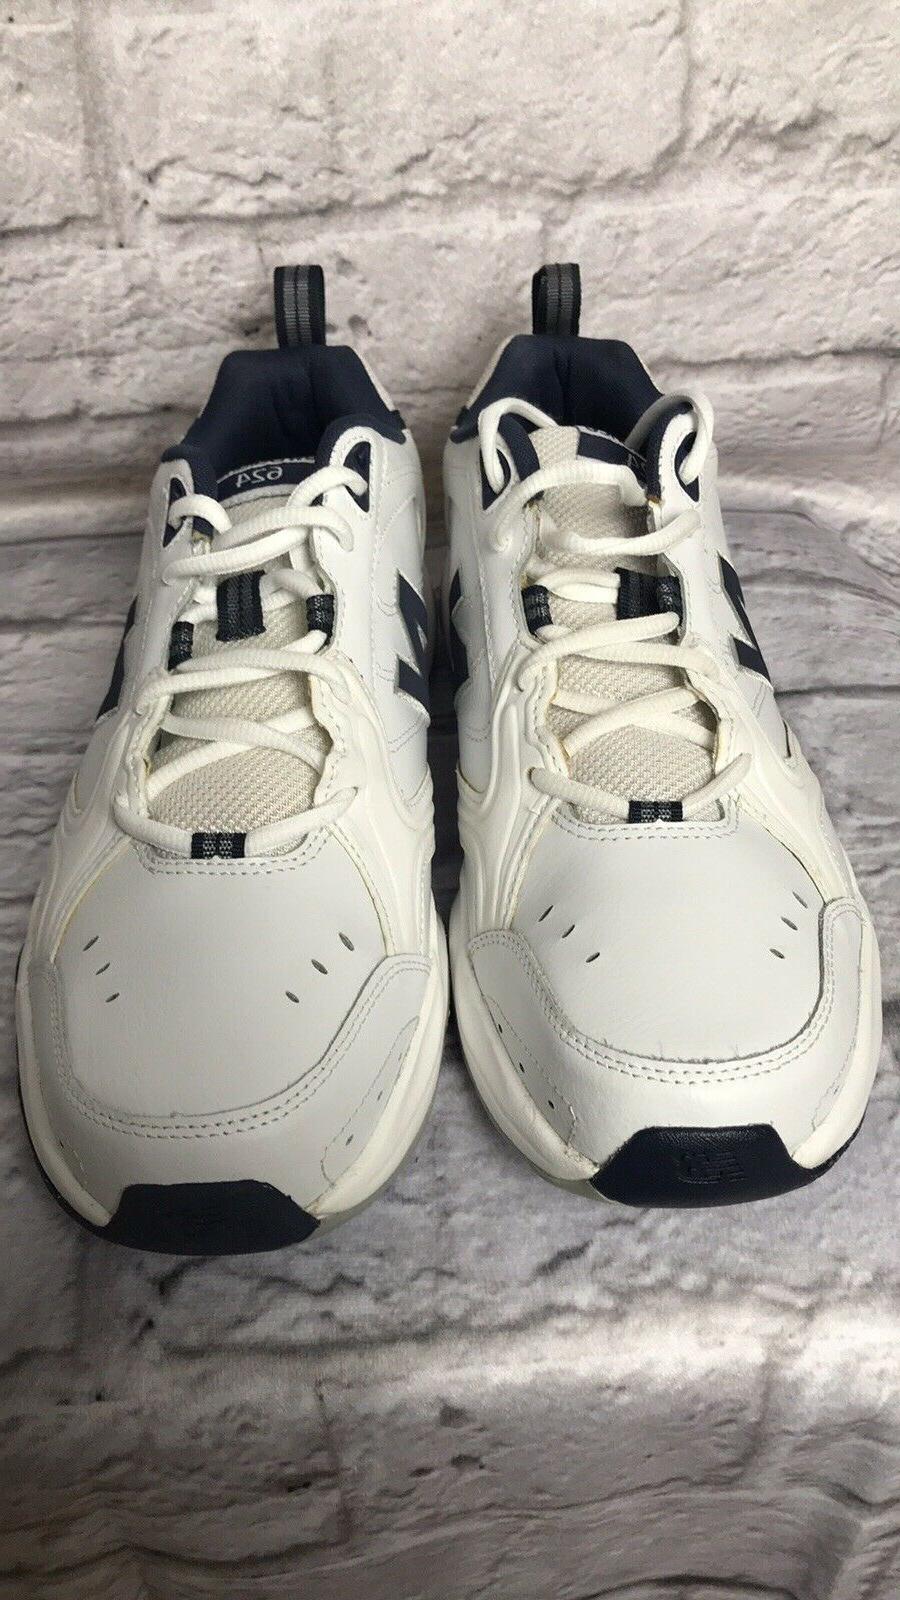 New Balance 624 Shoes Sz Mens